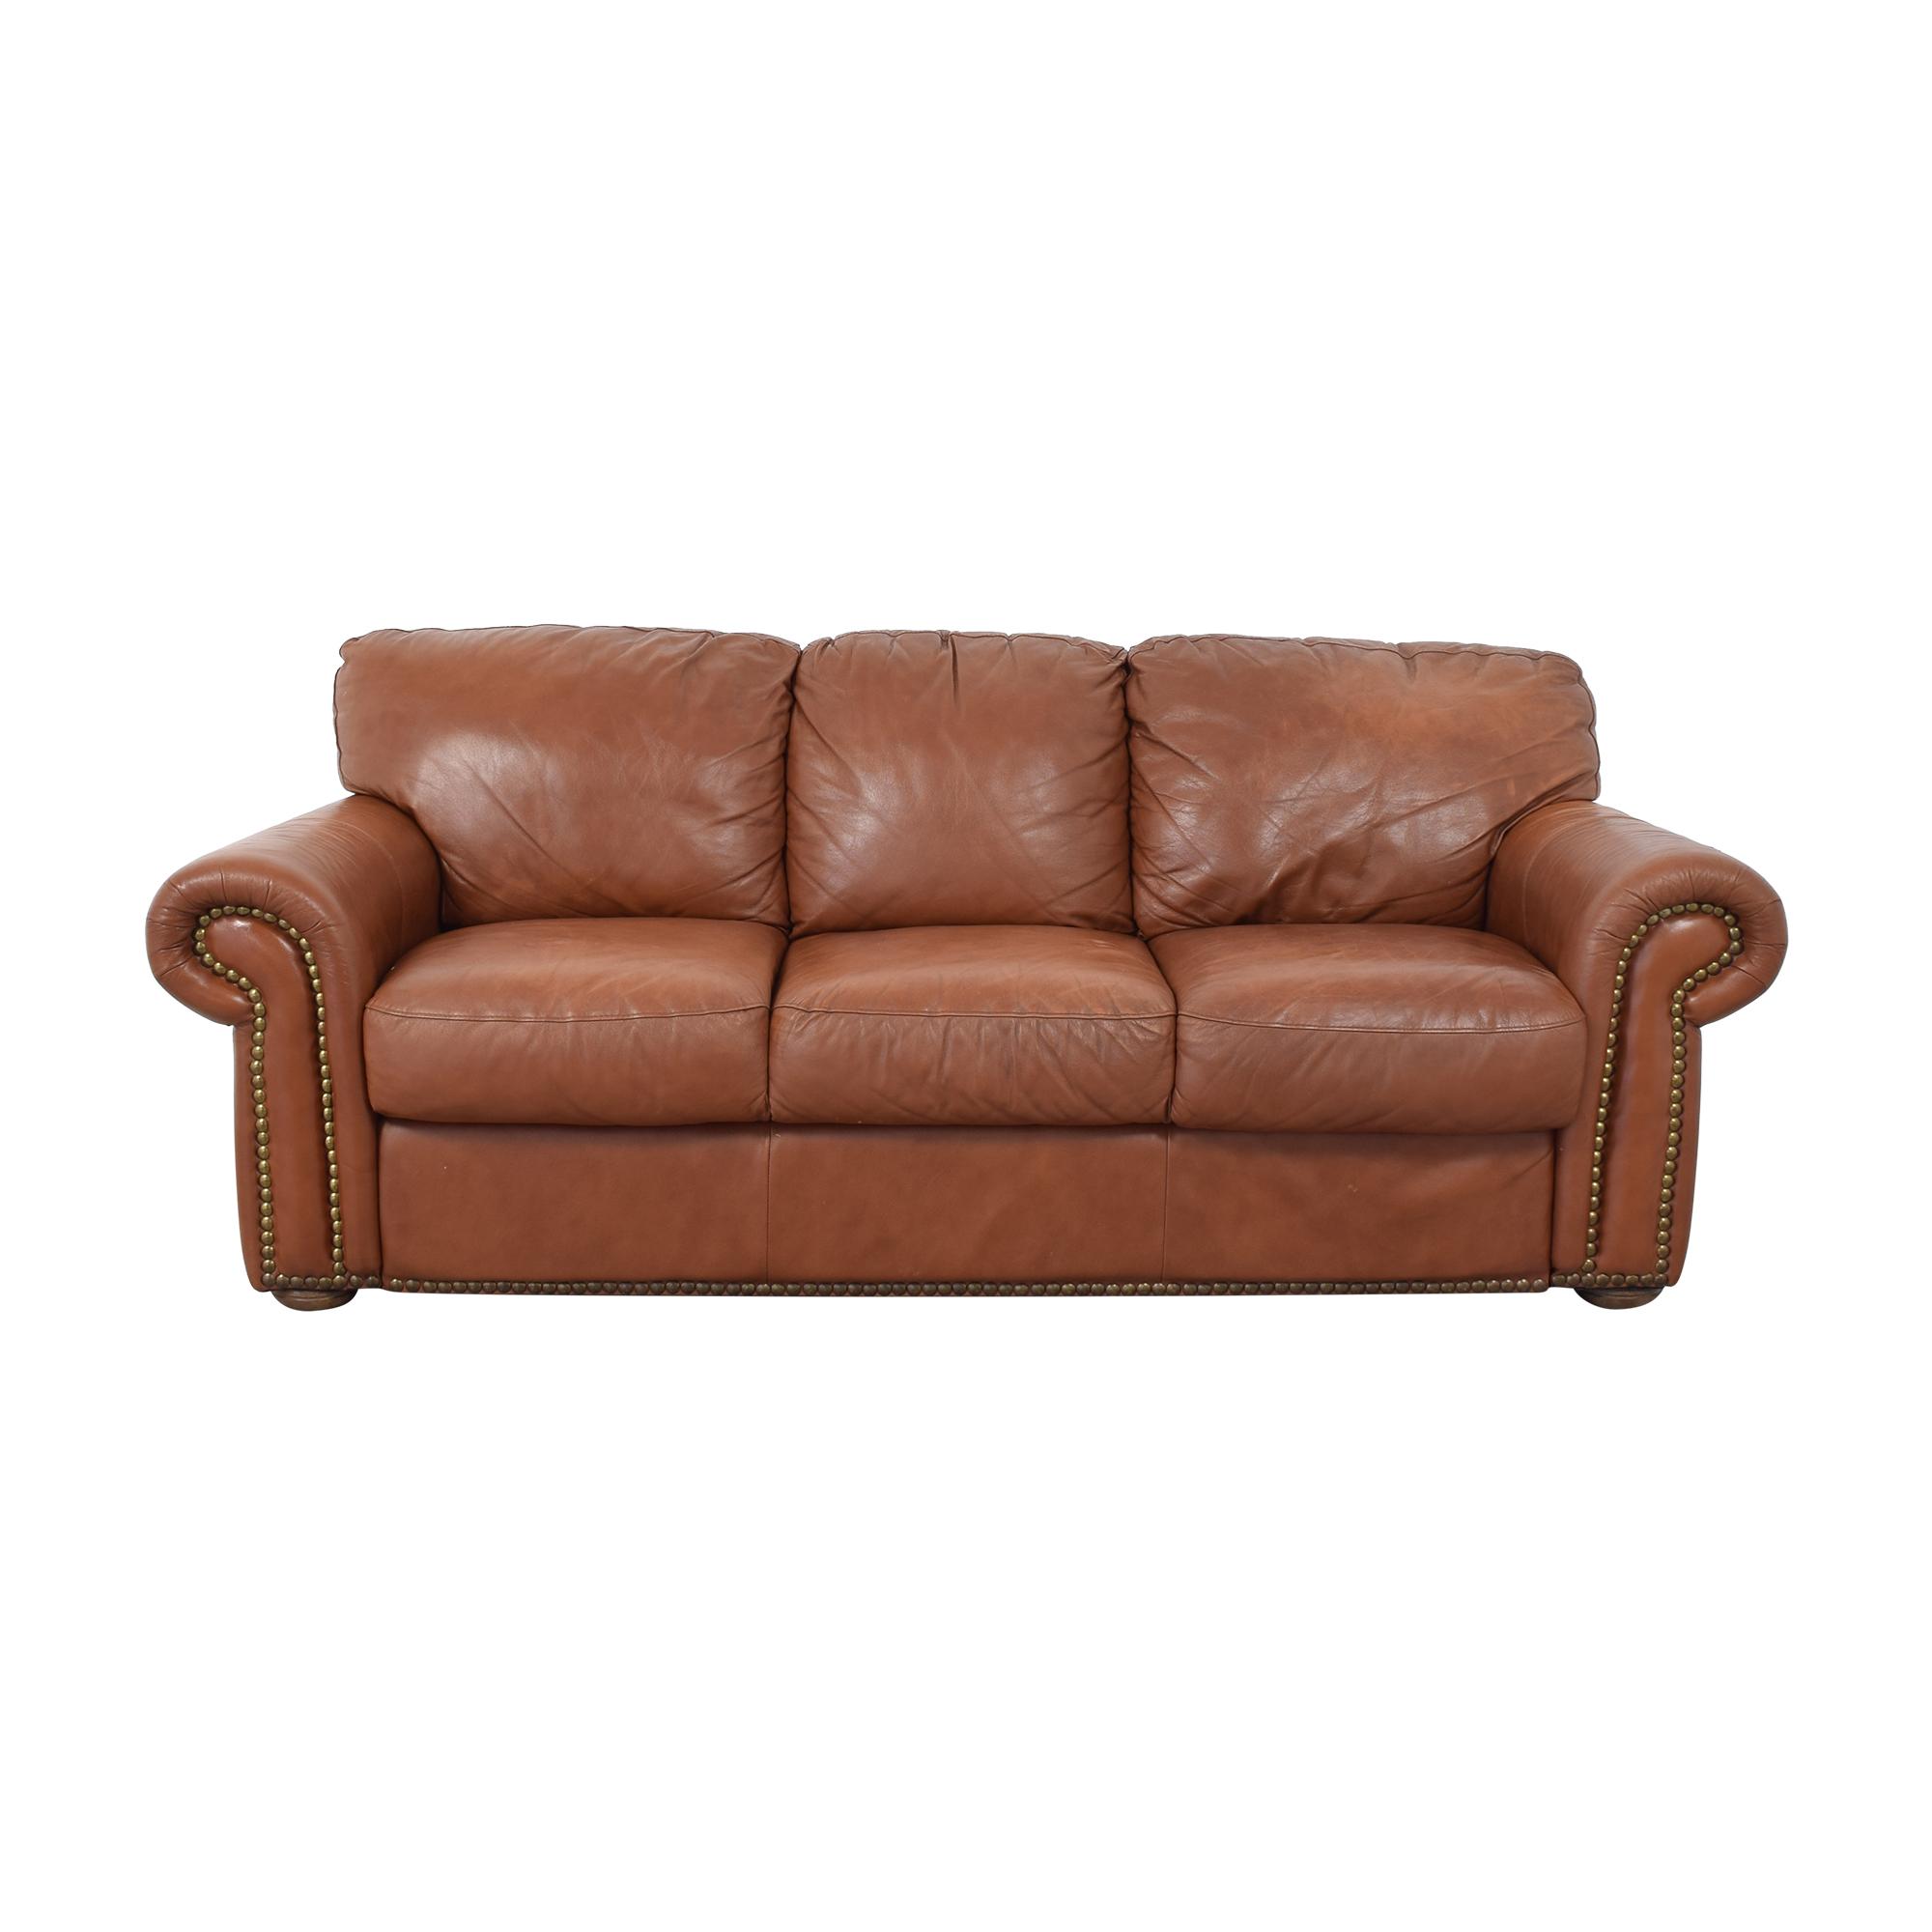 shop Bloomingdale's Bloomingdale's Three Cushion Nailhead Sofa online